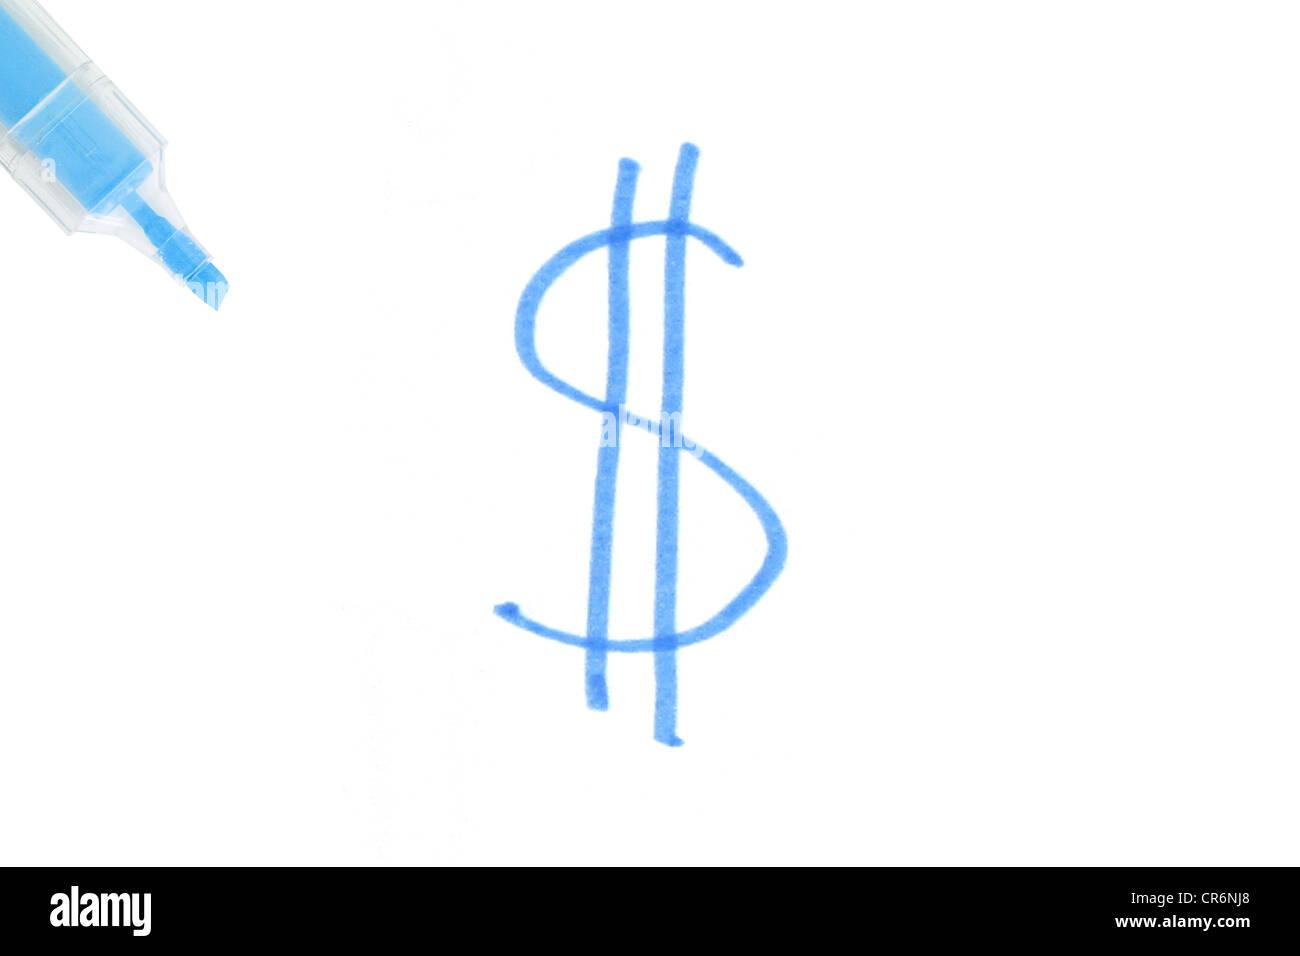 dollar - Stock Image